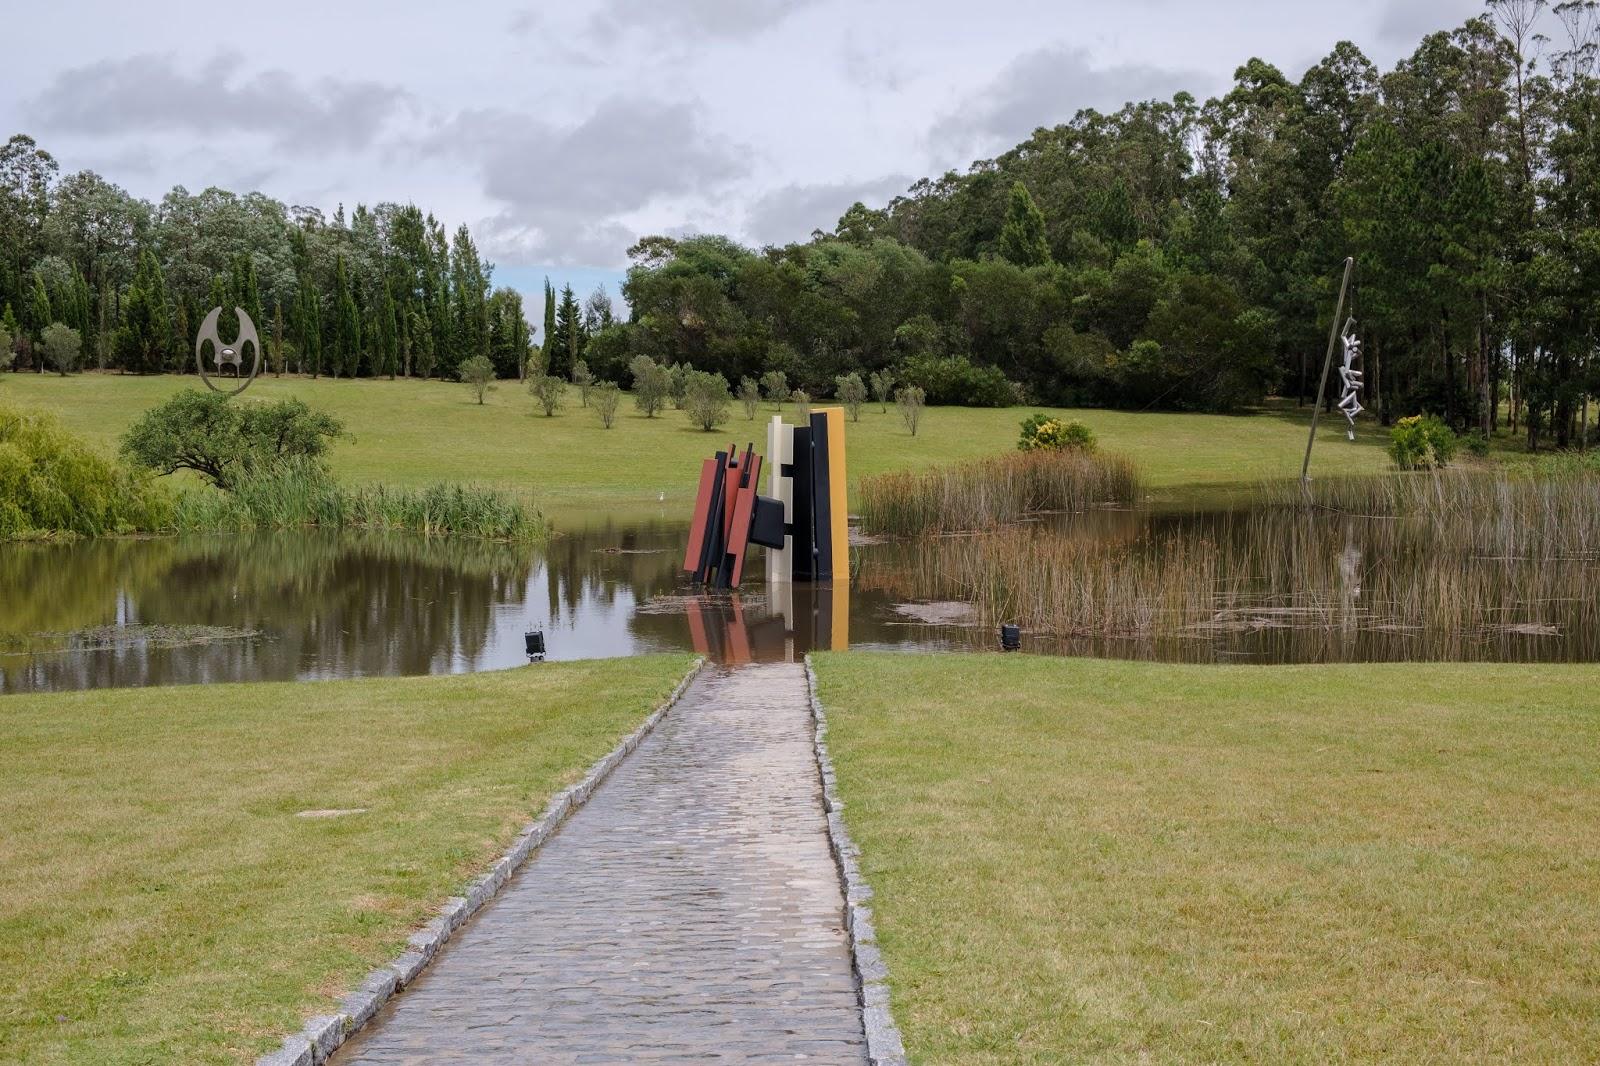 Parque de esculturas em Punta del Este